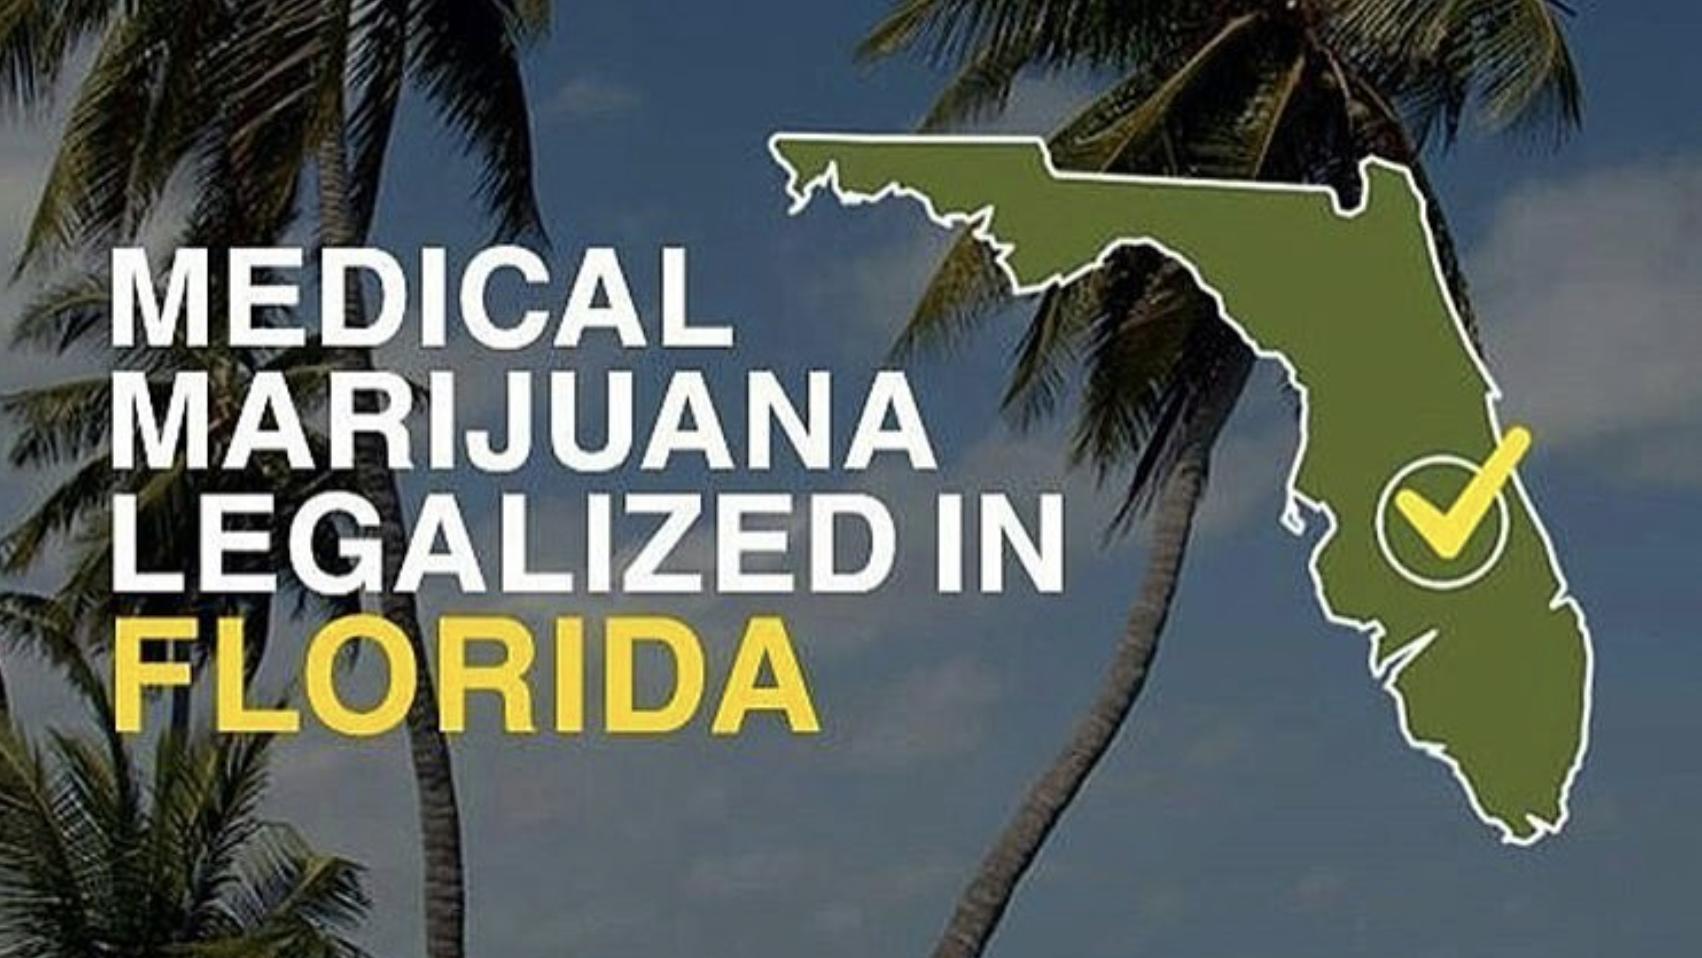 Taxing Medical Marijuana Bill HB 1455 Appears Dead On Arrival In Florida Senate